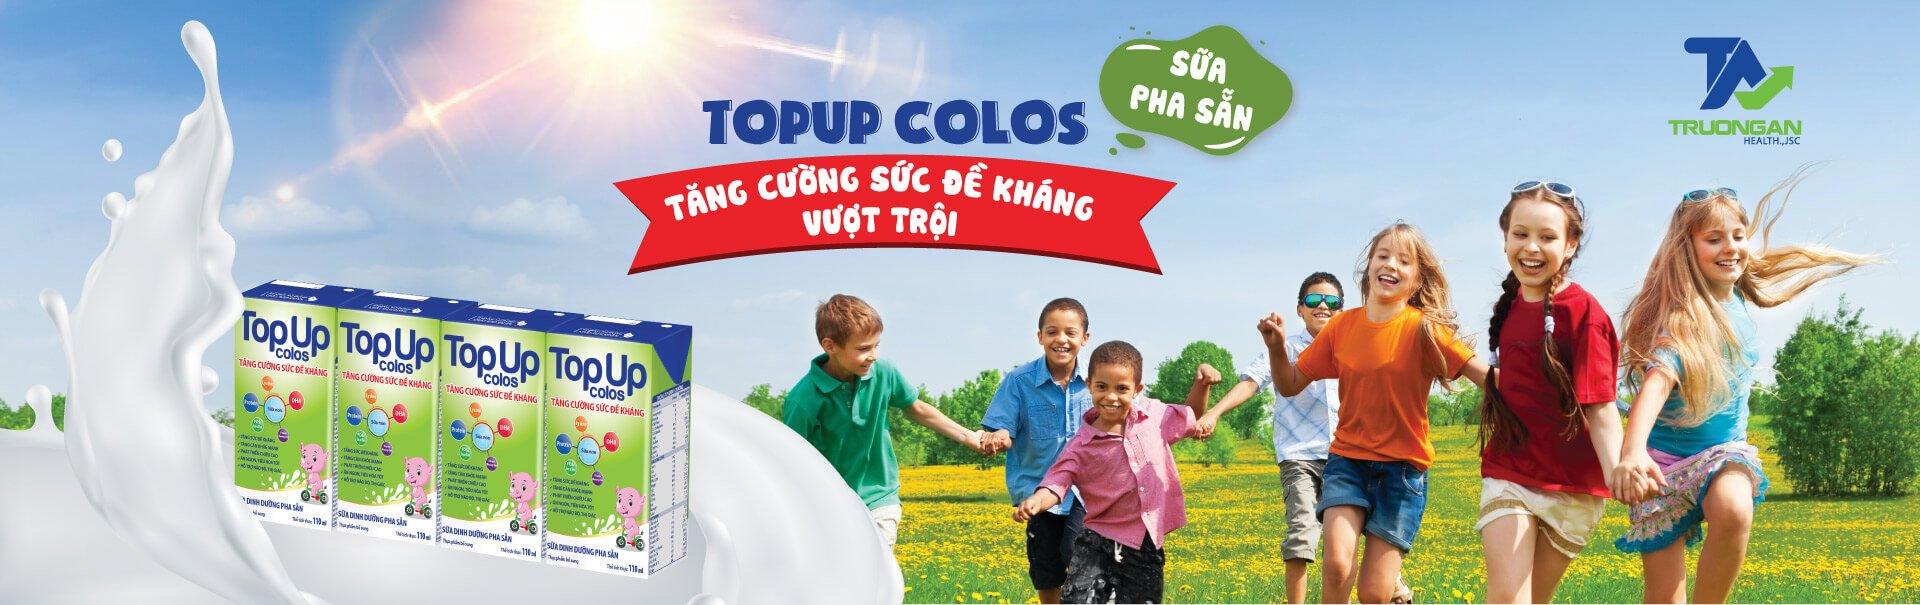 truonganjsc-banner-topup-colos-sua-nuoc